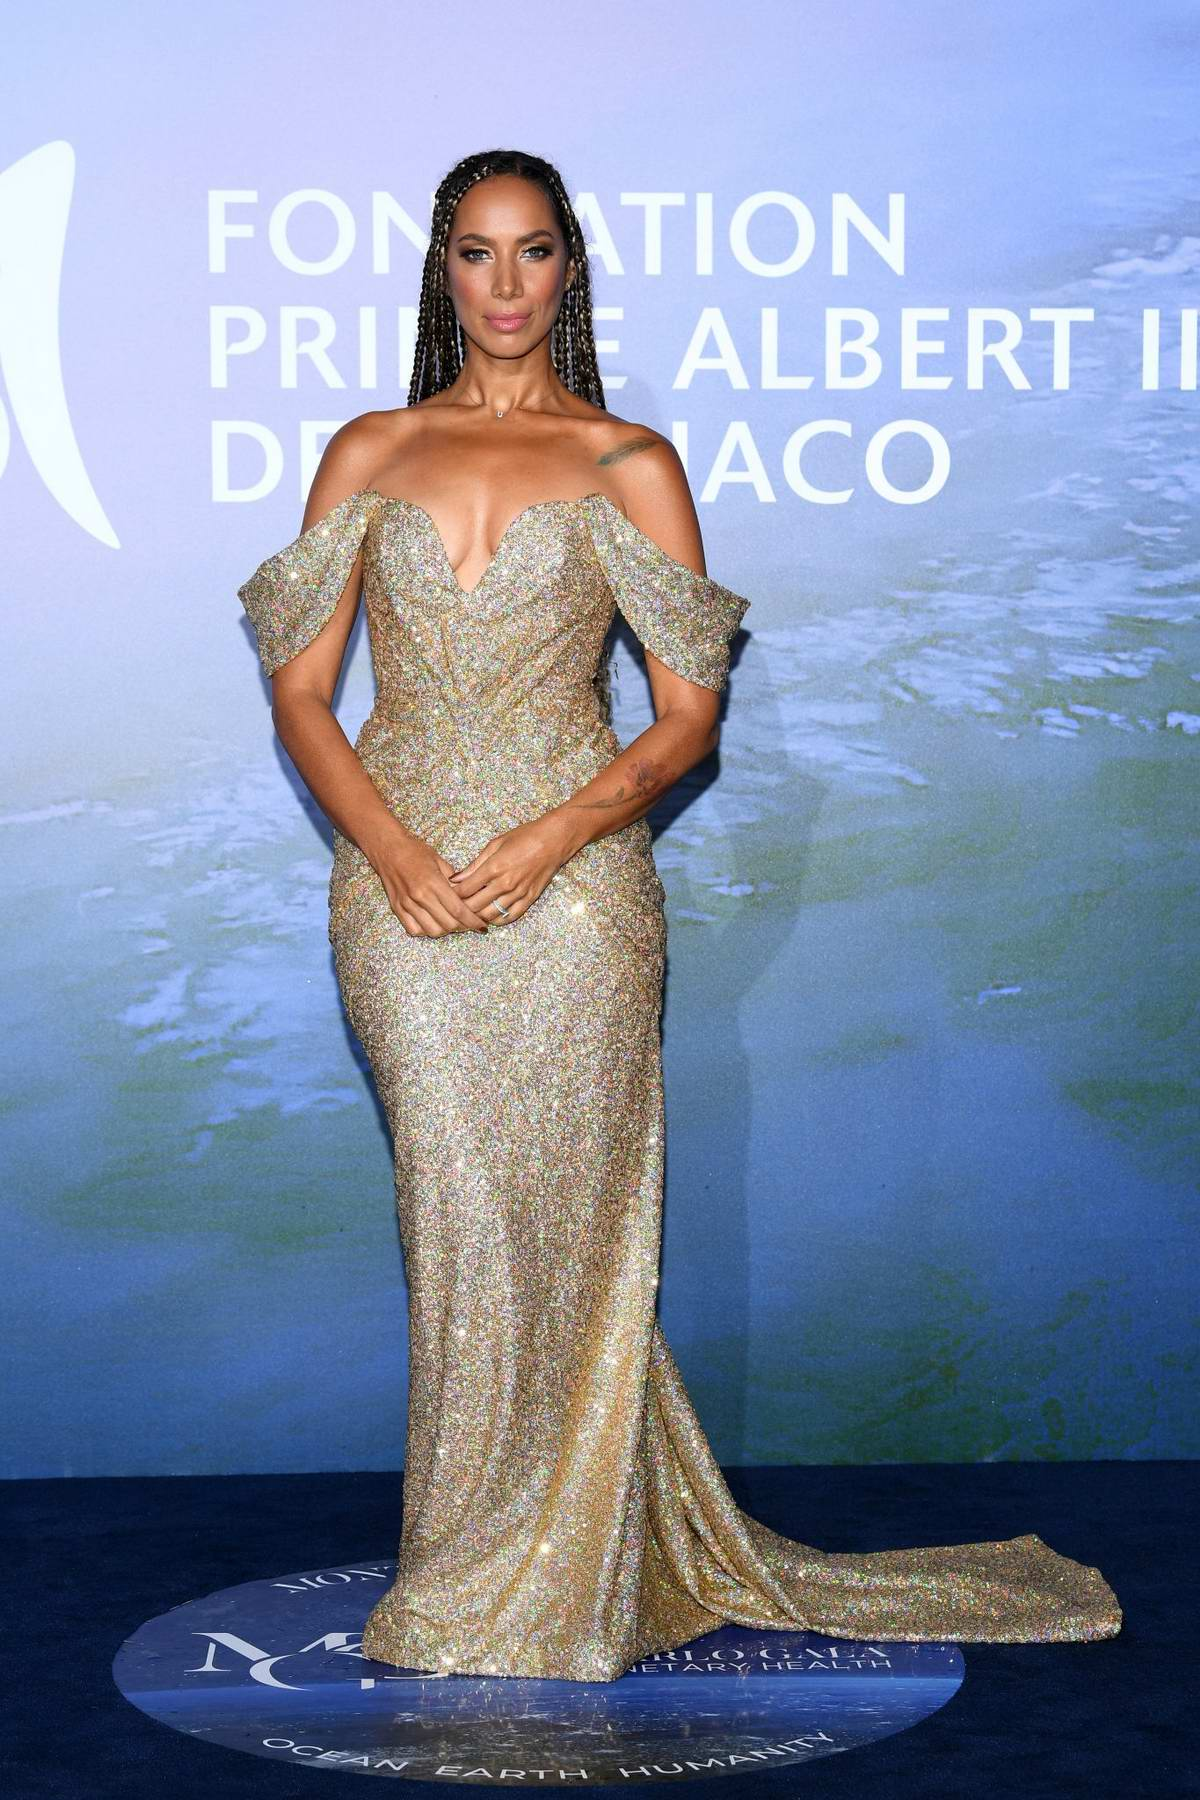 Leona Lewis attends the Monte Carlo Gala For Planetary Health in Monte Carlo, Monaco